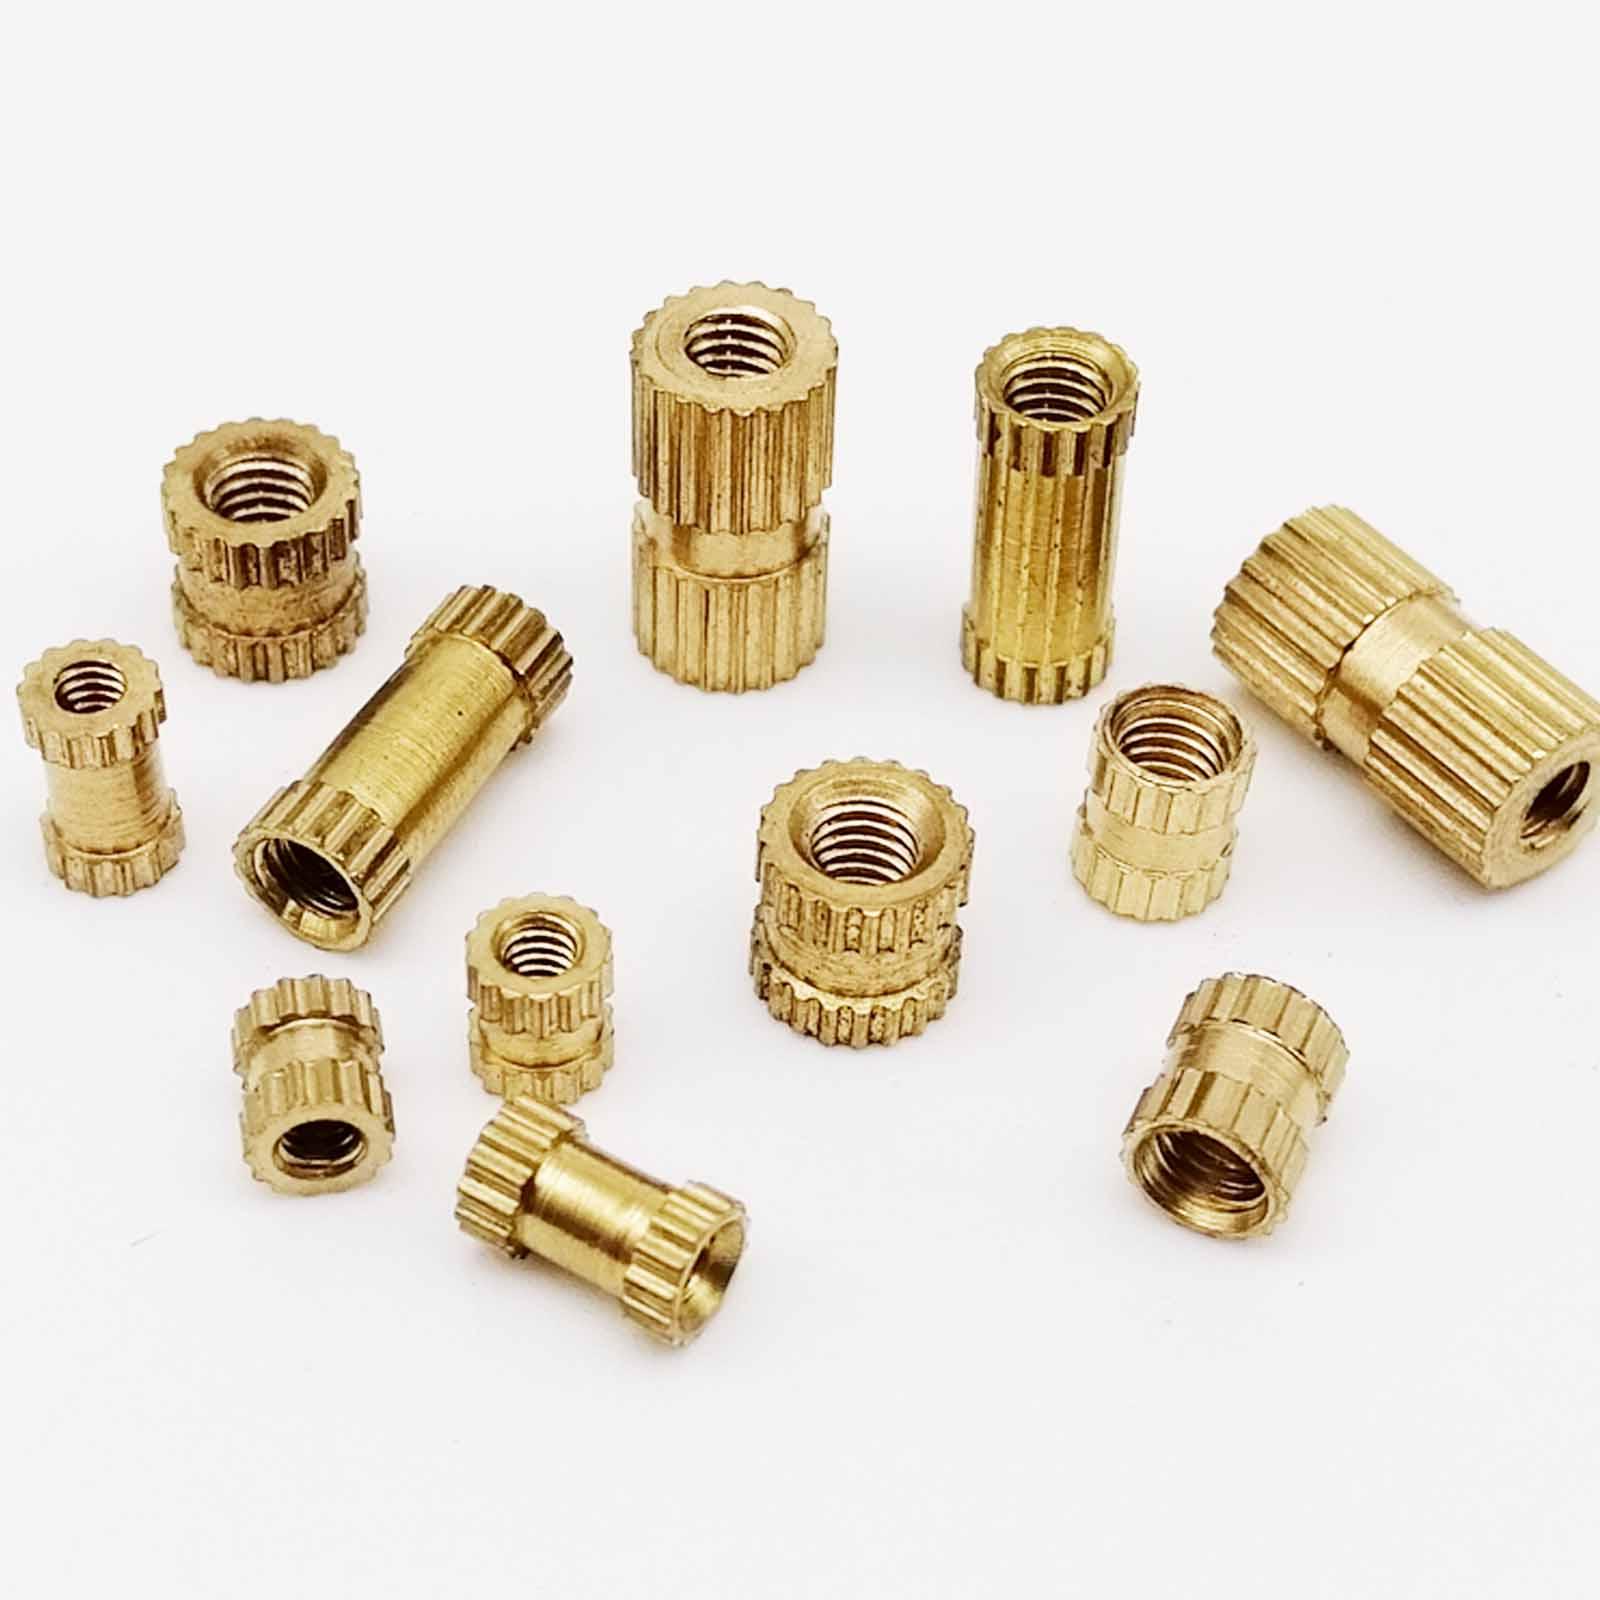 25X M2 M2.5 M3 Solid Brass Pure Copper Metric Thread Injection Molding Knurl Insert Nut Nutsert Round Shape Column OD 3.5 4 5mm